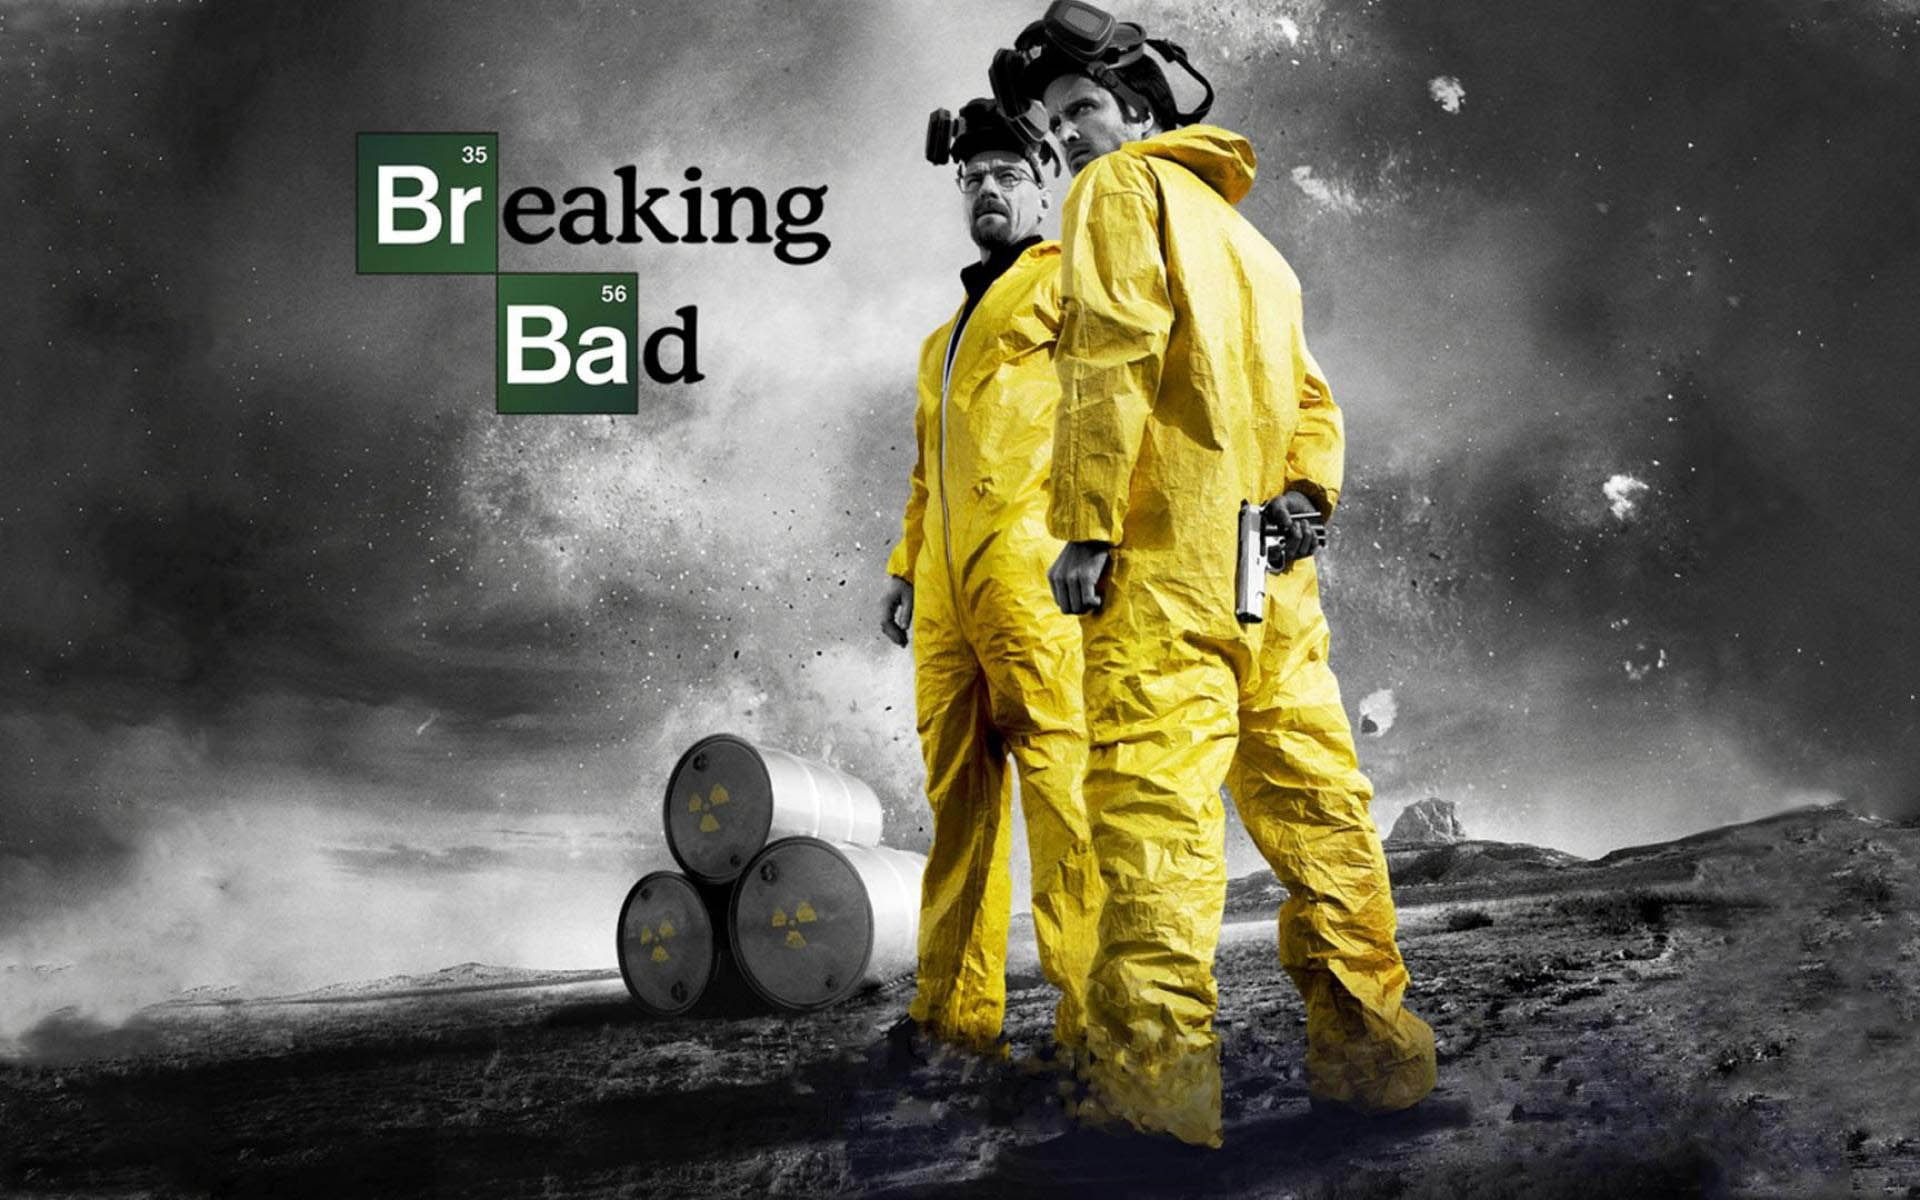 breakingbadimages - Google Search___©__!!!!